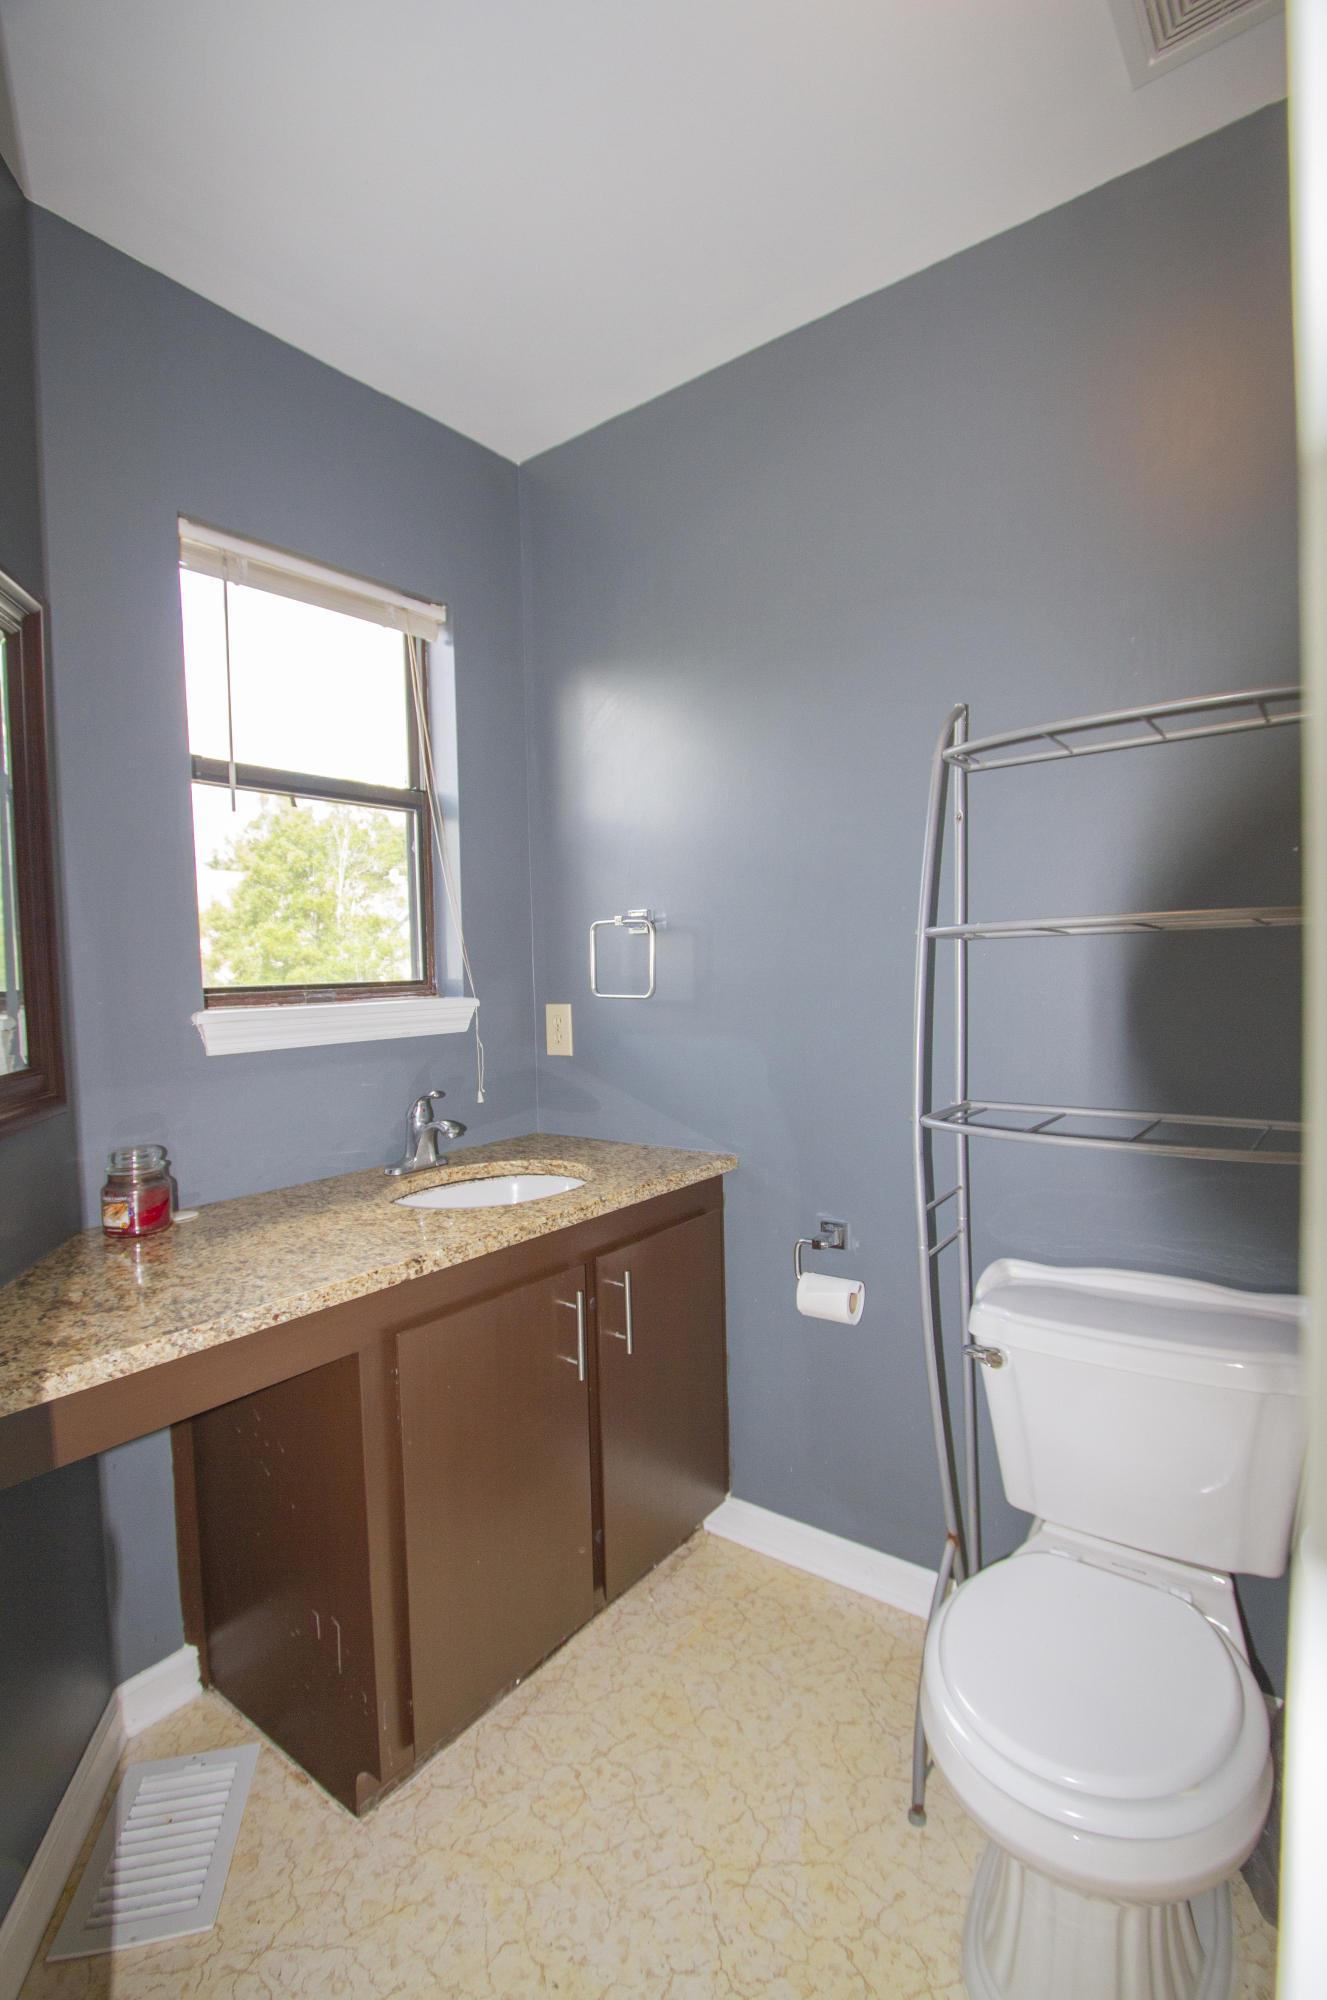 Marsh Point Homes For Sale - 1060 Marsh Court, Mount Pleasant, SC - 8